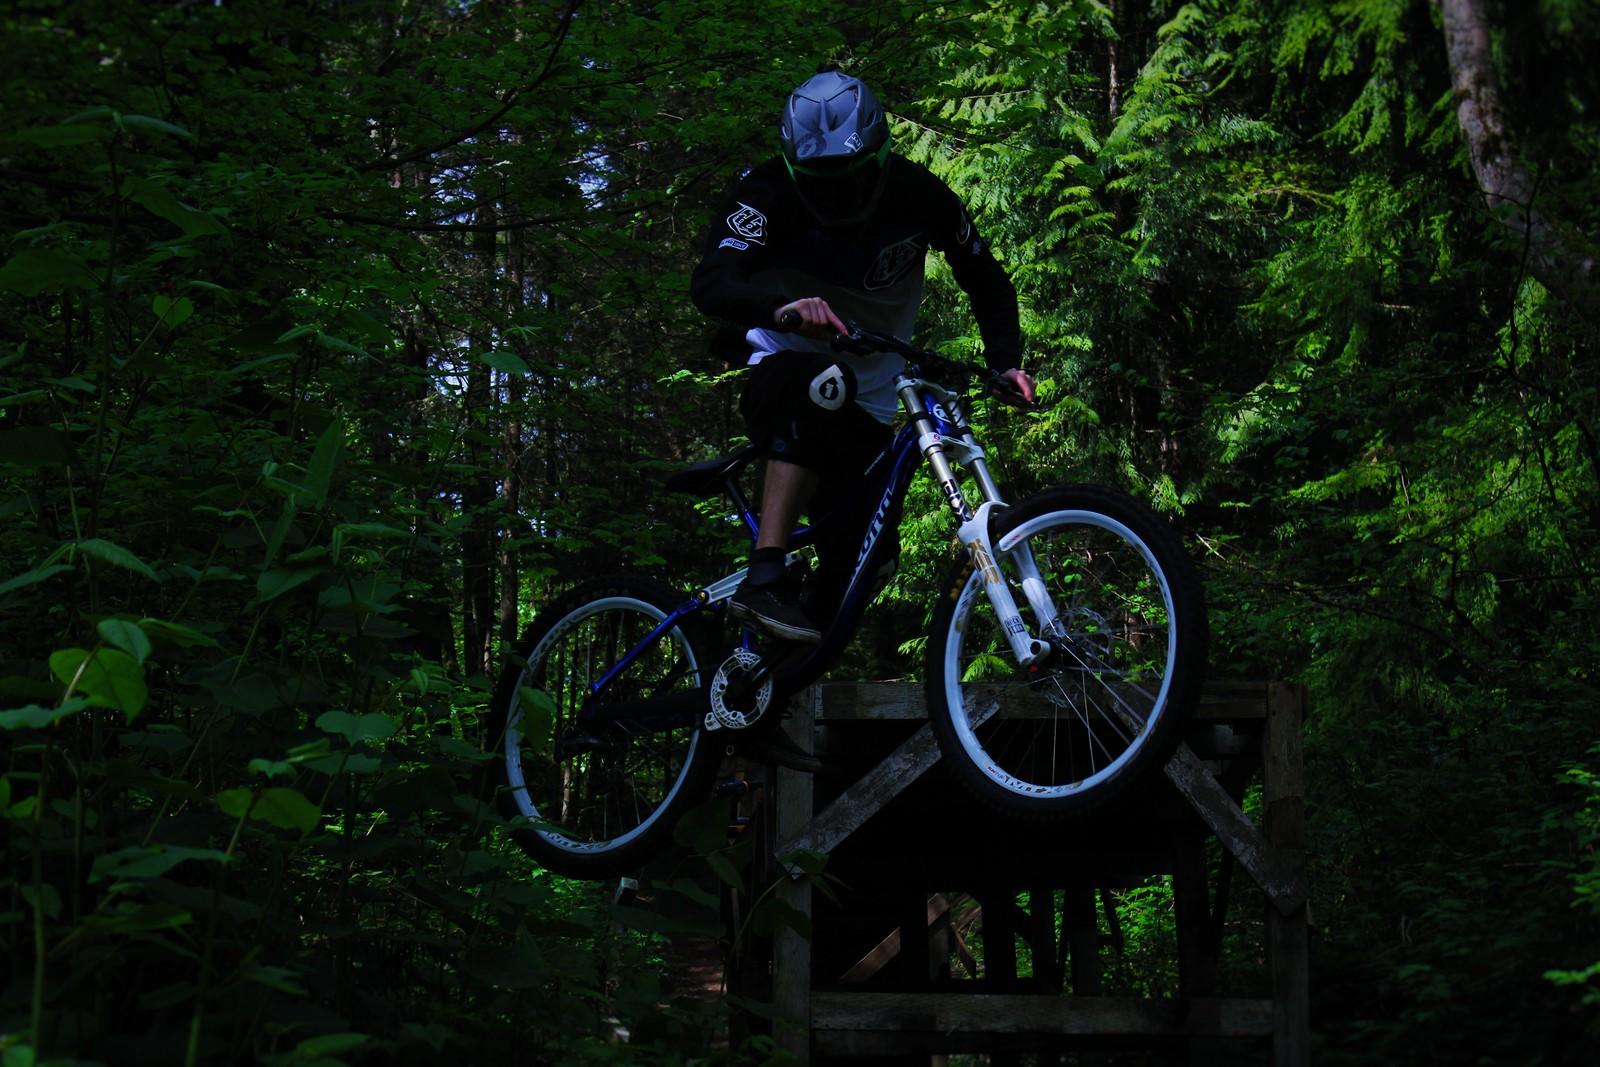 Northwest Riding - trebeol - Mountain Biking Pictures - Vital MTB